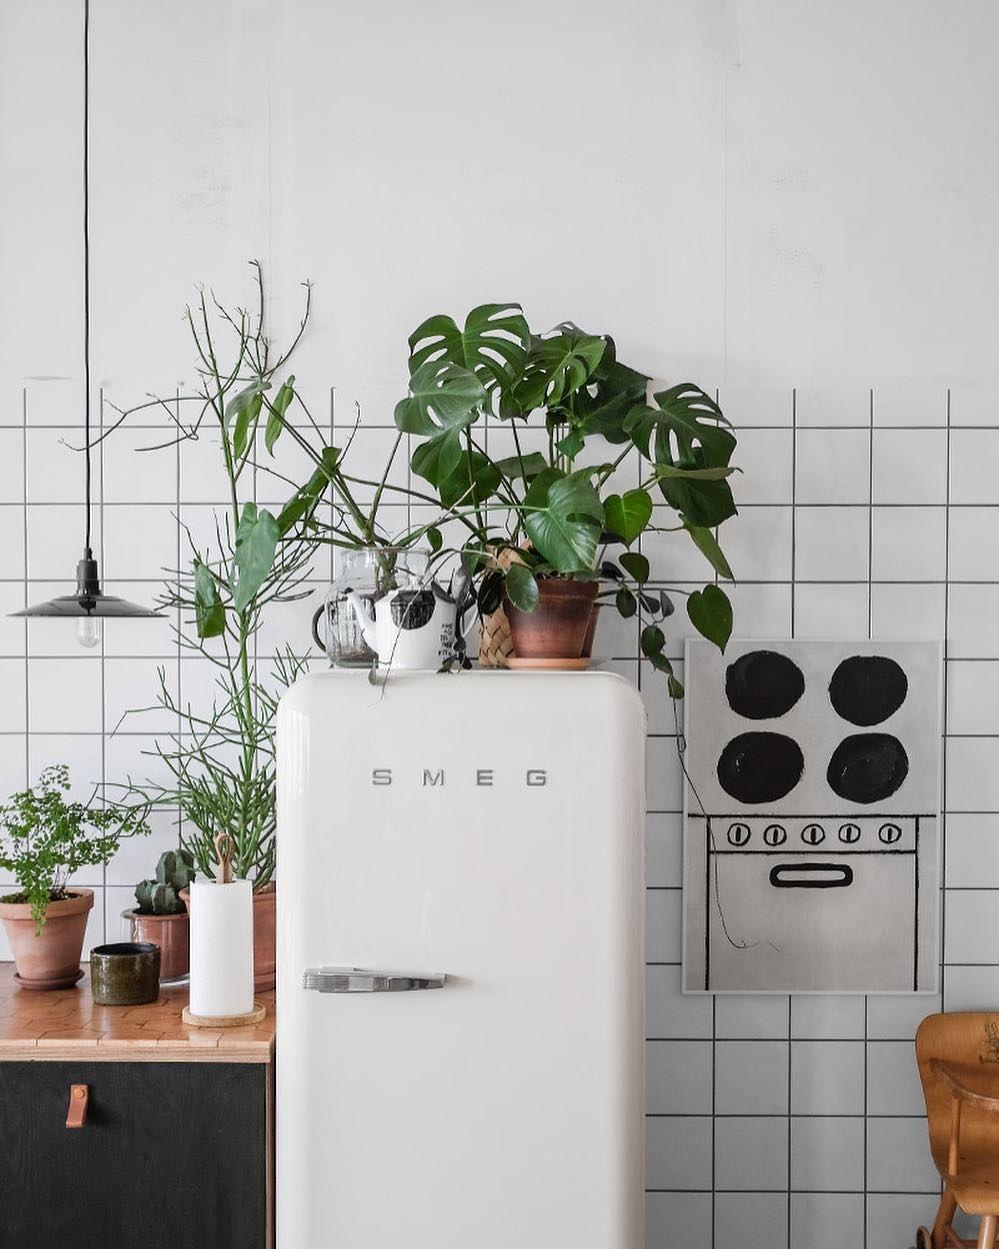 Plants For Kitchen To Decorate It: Plants In The Kitchen White Smeg Fridge